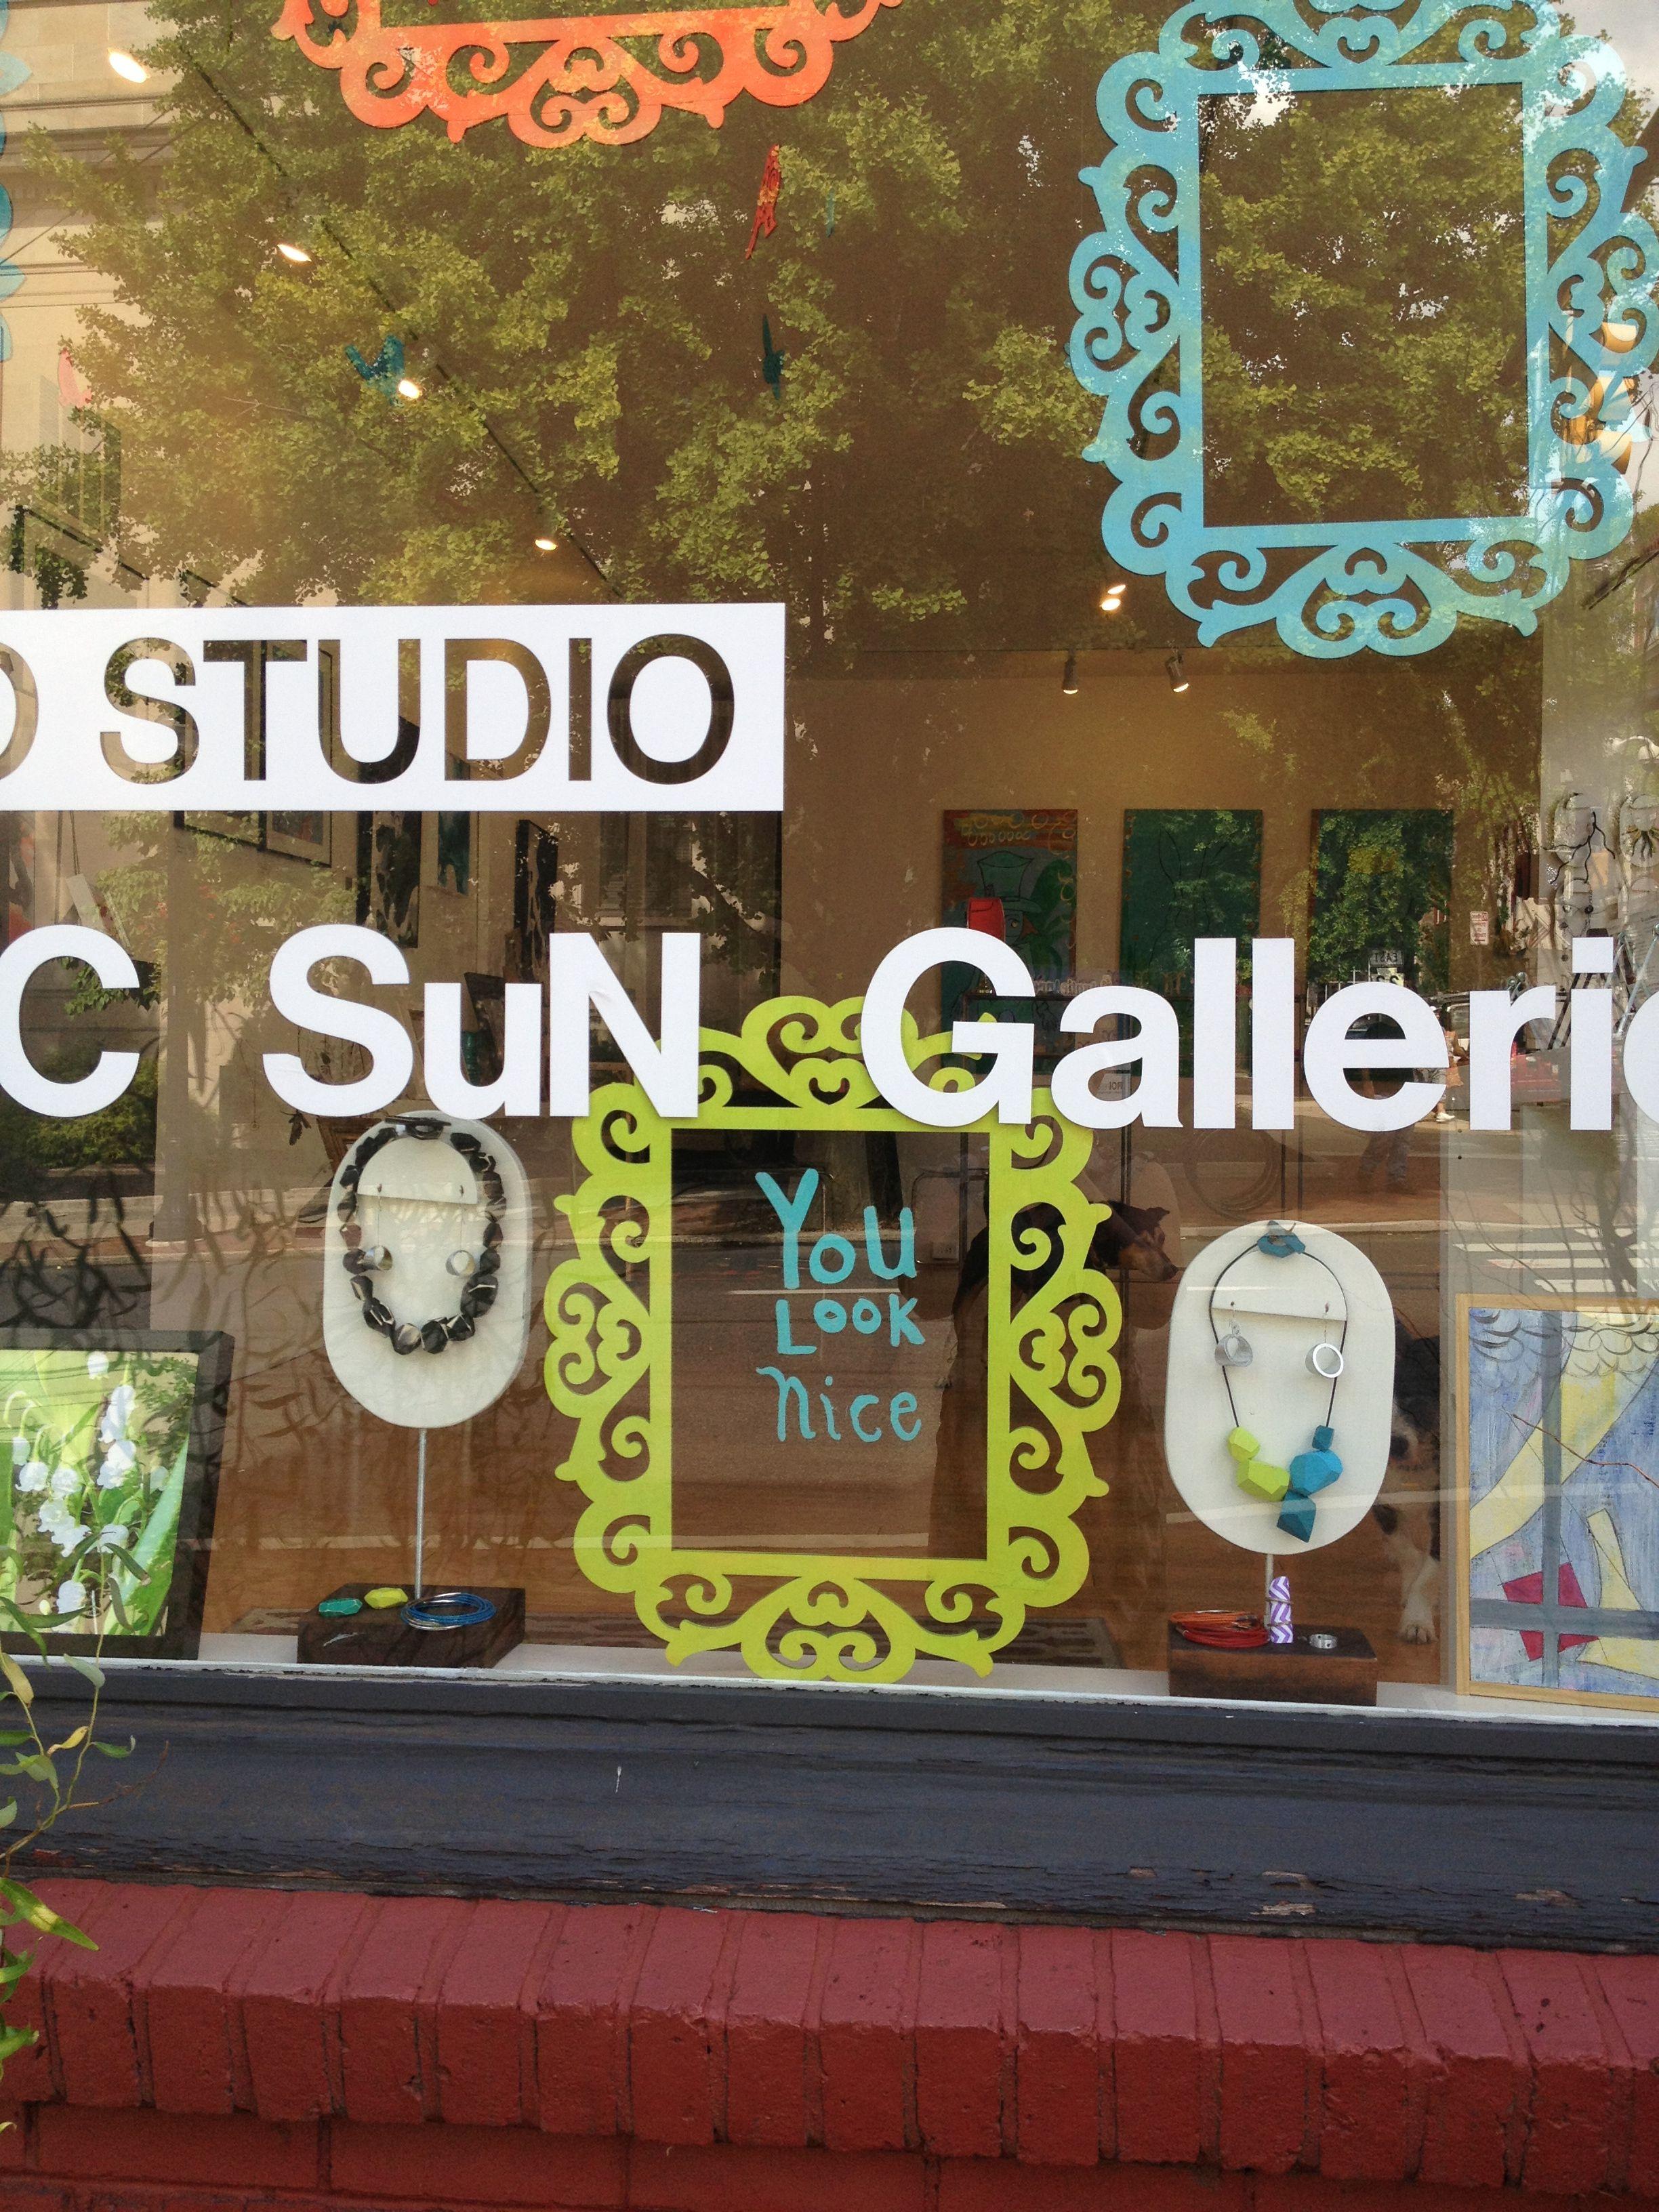 Mio studio gallery 154 N Prince St Lancaster PA www.miostudio.com